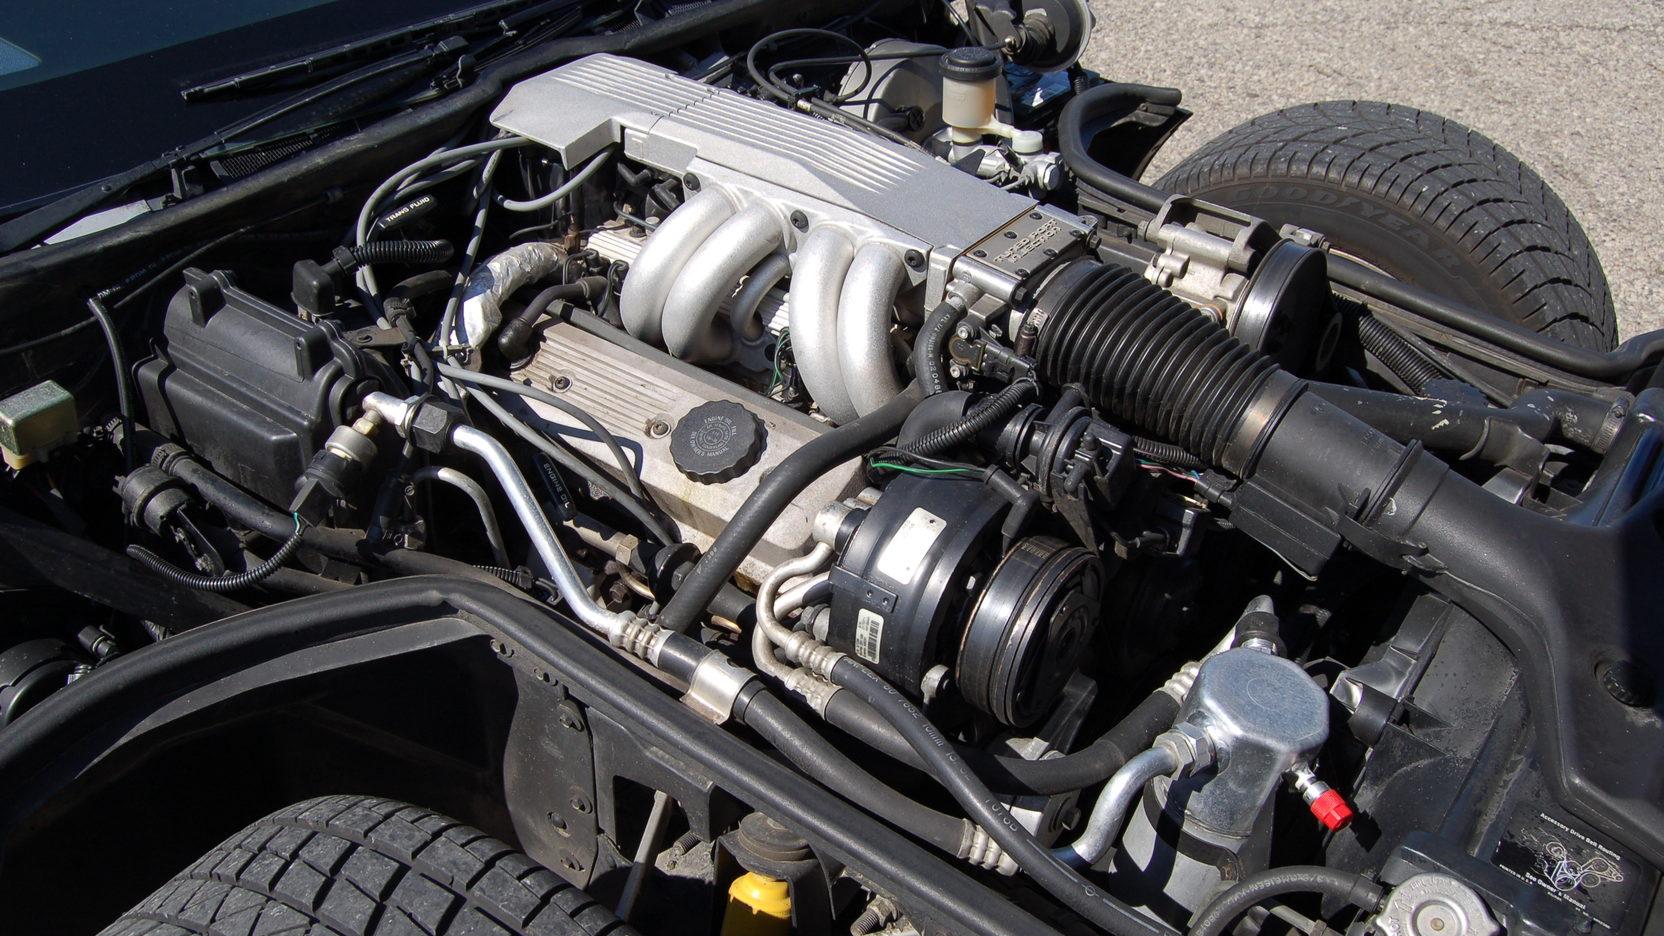 [SCHEMATICS_4HG]  C4 Corvettes are V-8 sports-car fun on the cheap | Hagerty Media | 1989 Corvette Engine Compartment Diagram |  | Hagerty